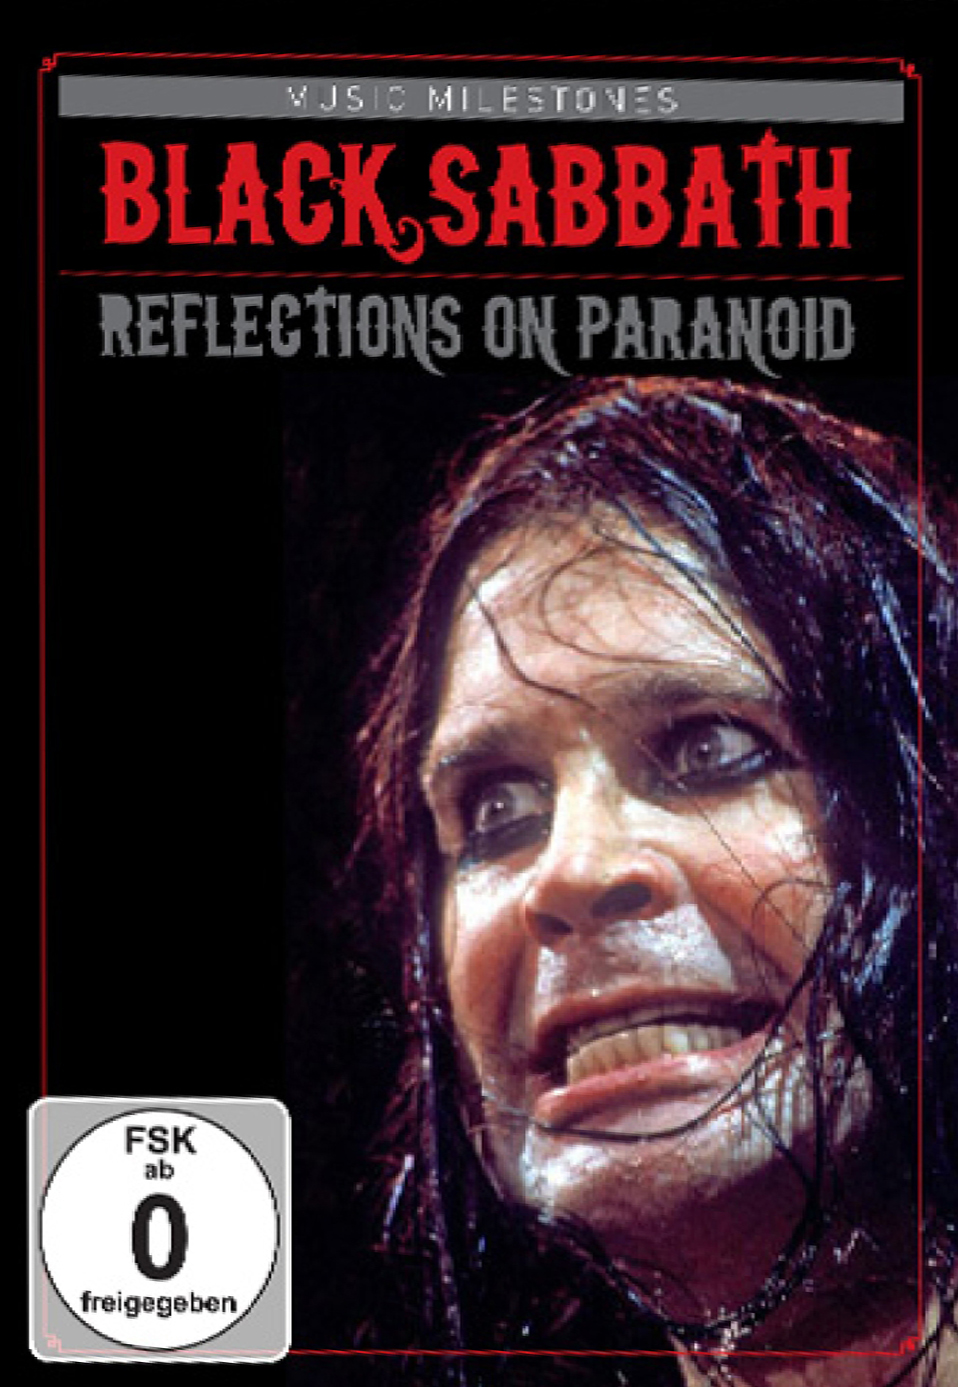 Black Sabbath: Music Milestones - Reflections on Paranoid